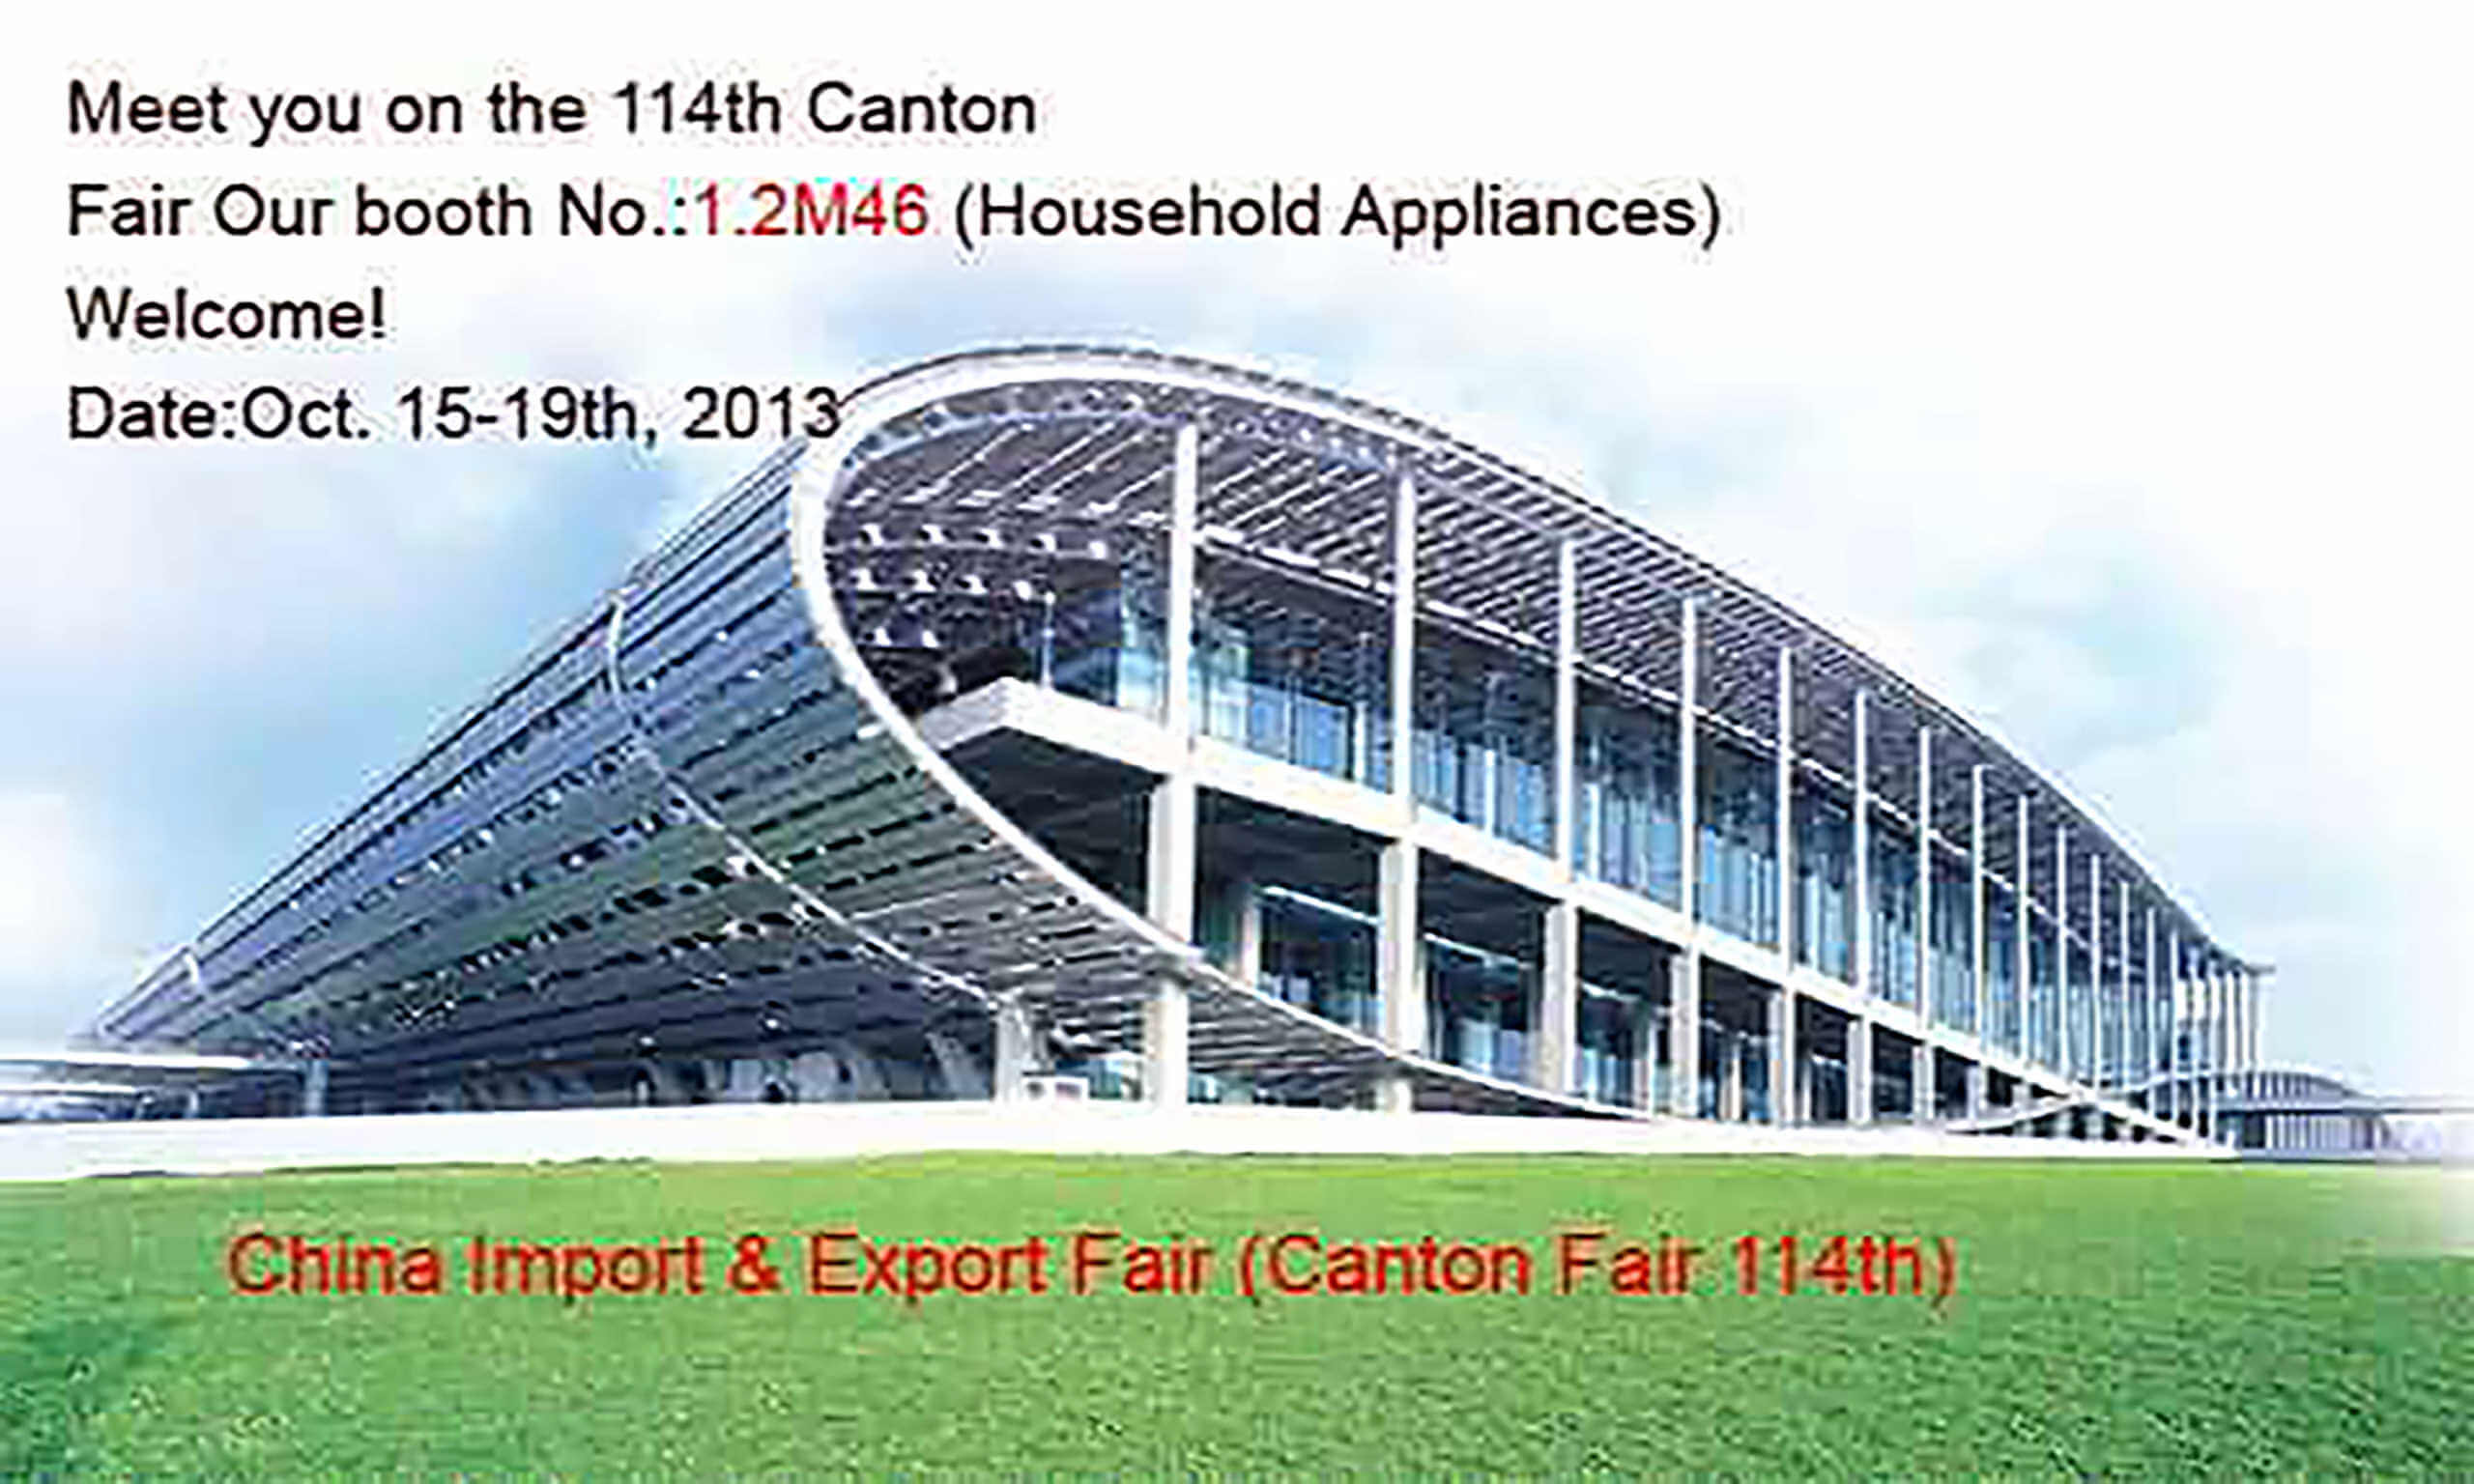 Faik Canton fair 114 -0